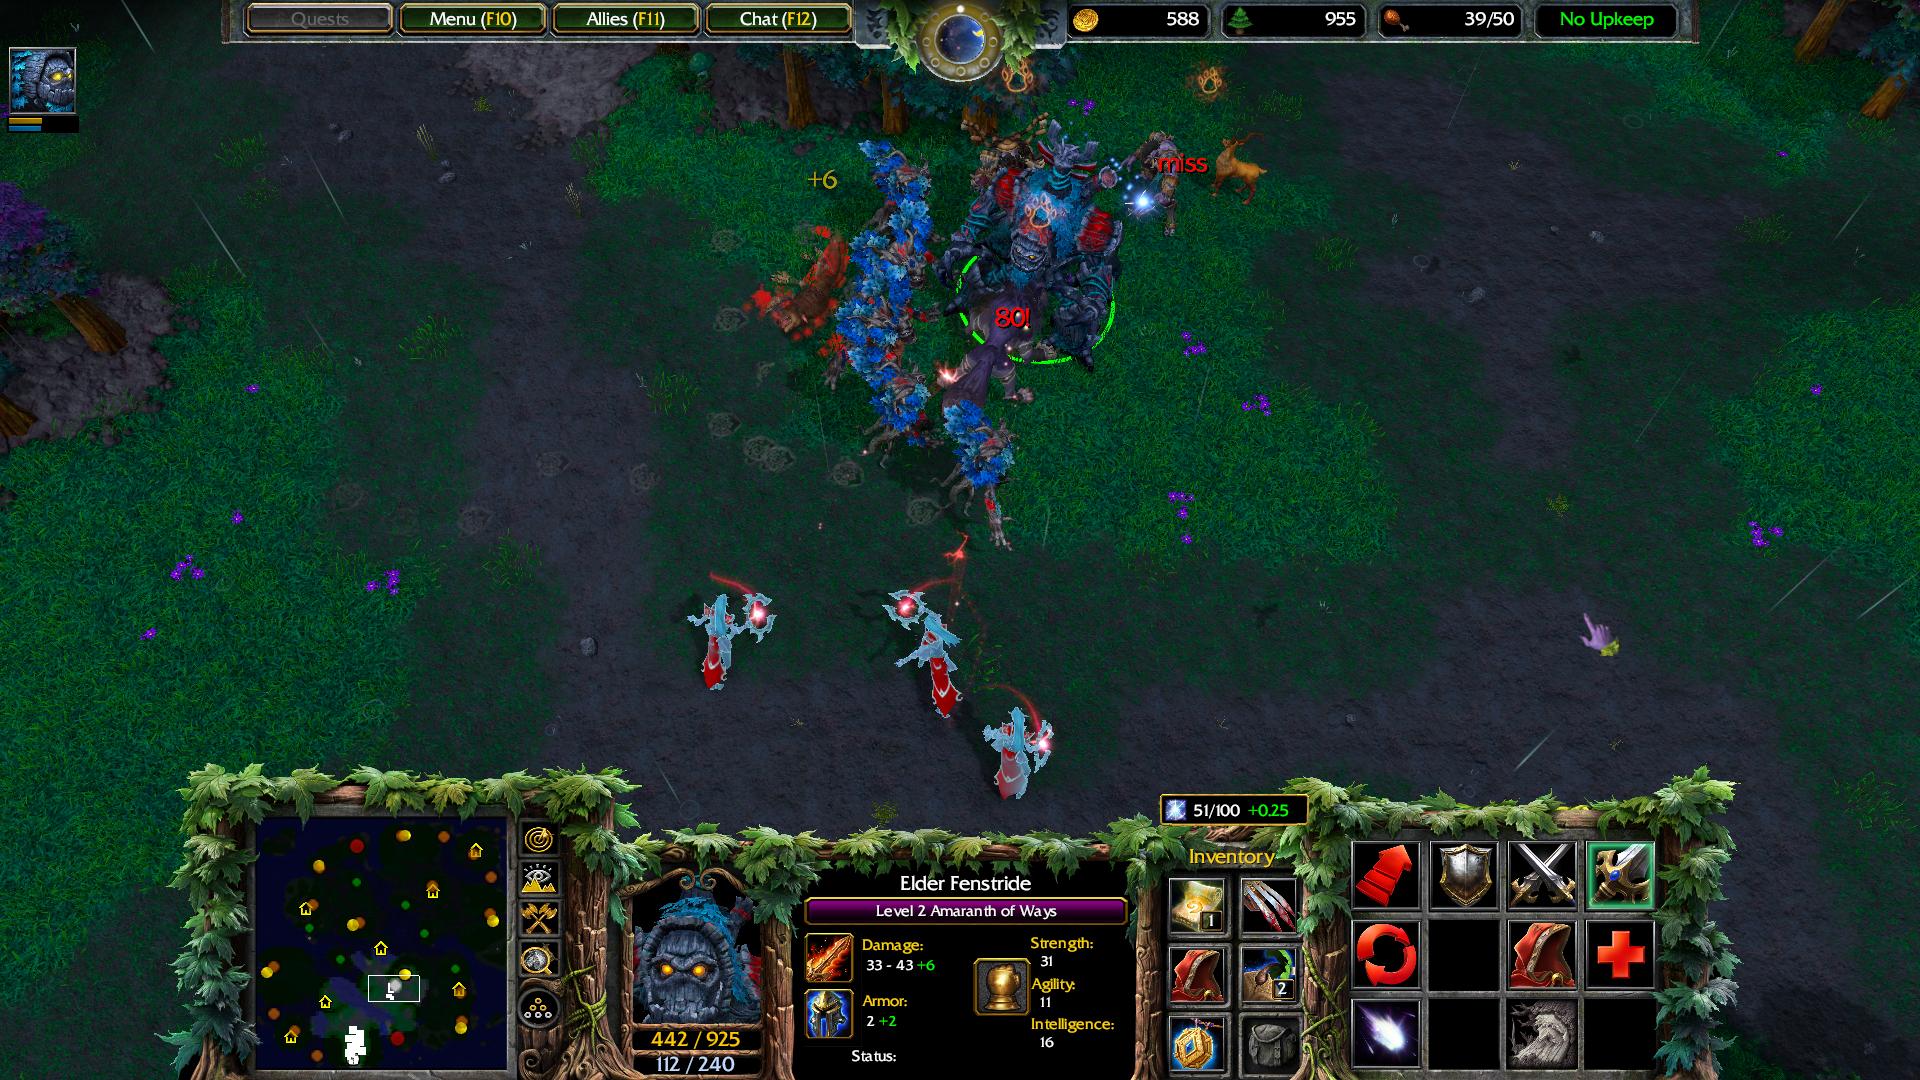 screenshot-1-png.354232